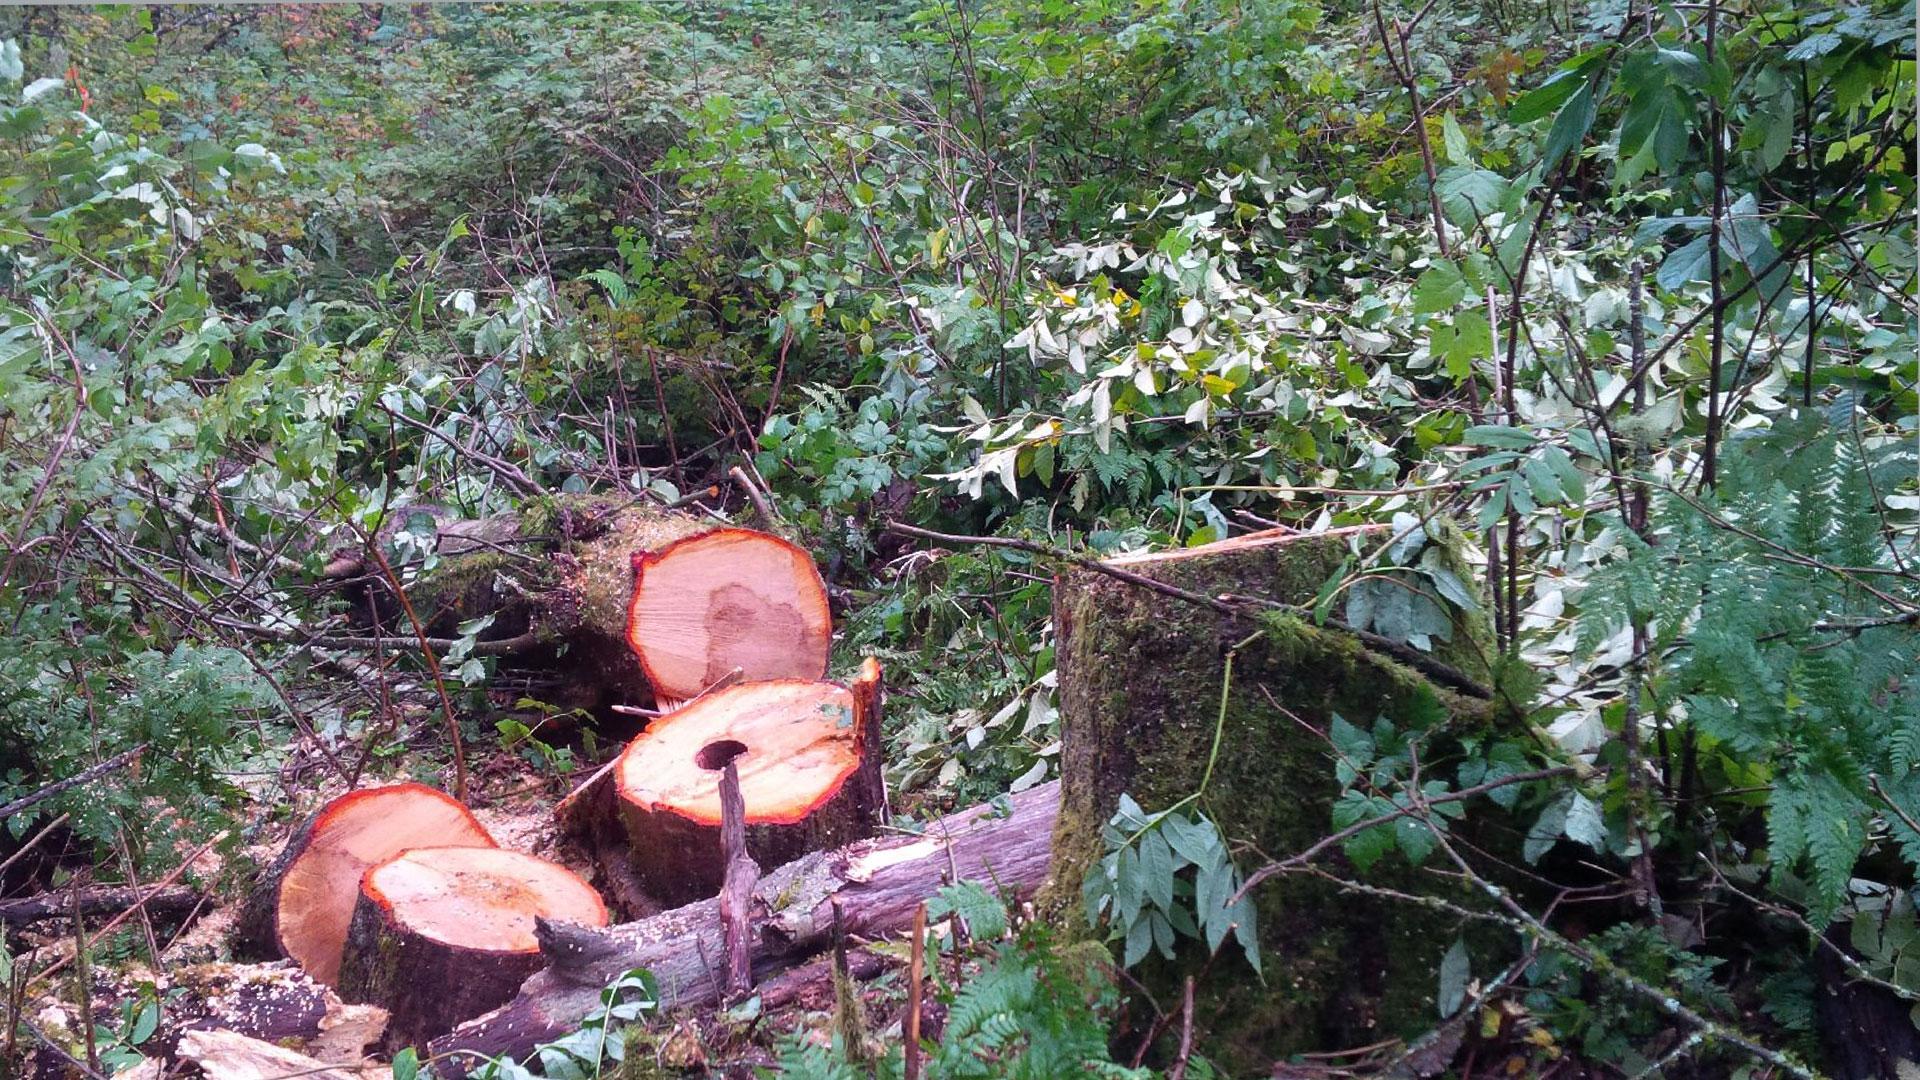 Burnaby Mountain Illegal Tree Cutting 1